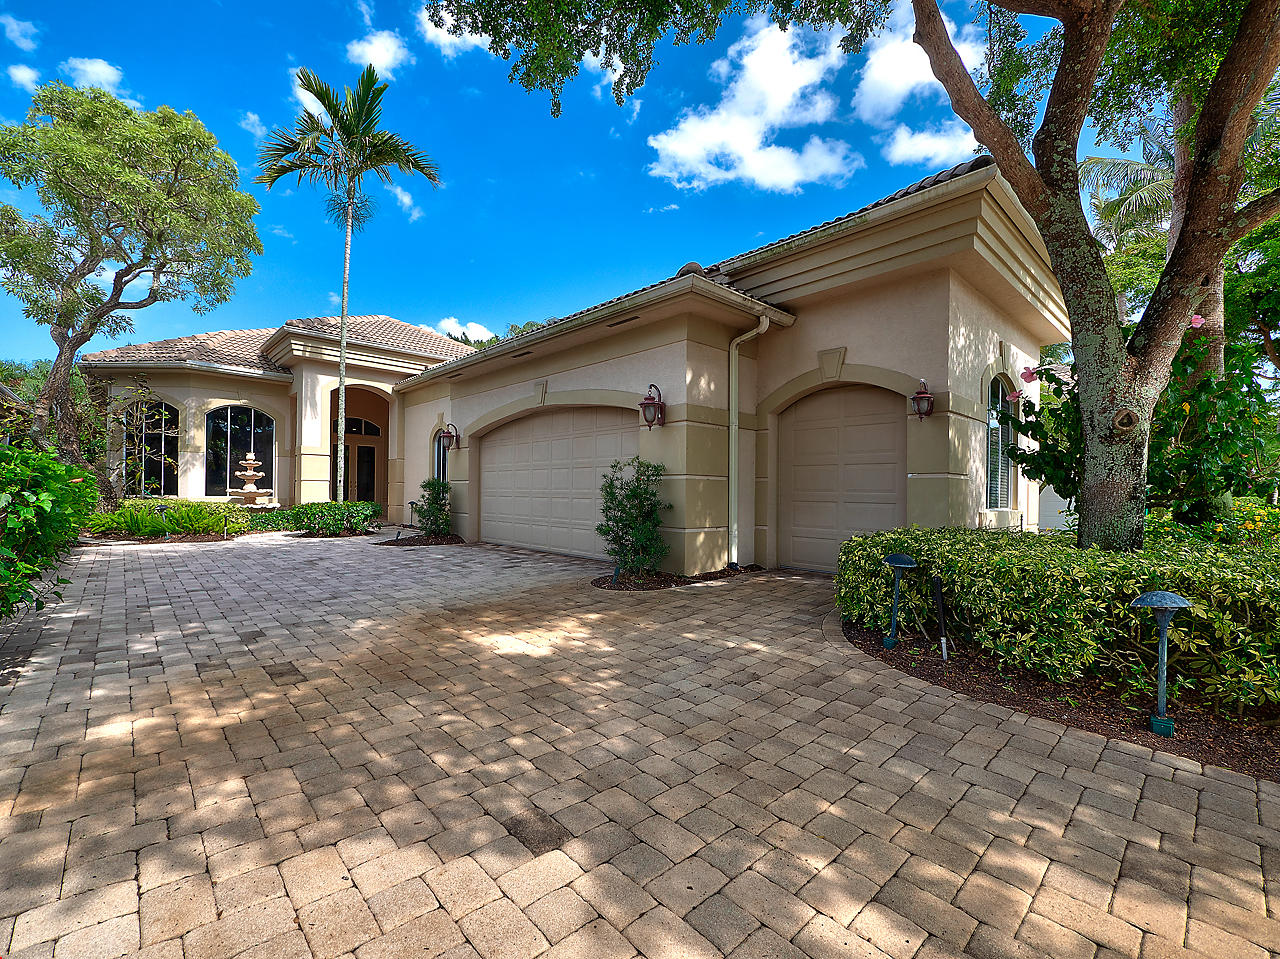 108 Island Cove Way Palm Beach Gardens,Florida 33418,3 Bedrooms Bedrooms,4 BathroomsBathrooms,A,Island Cove,RX-10426318